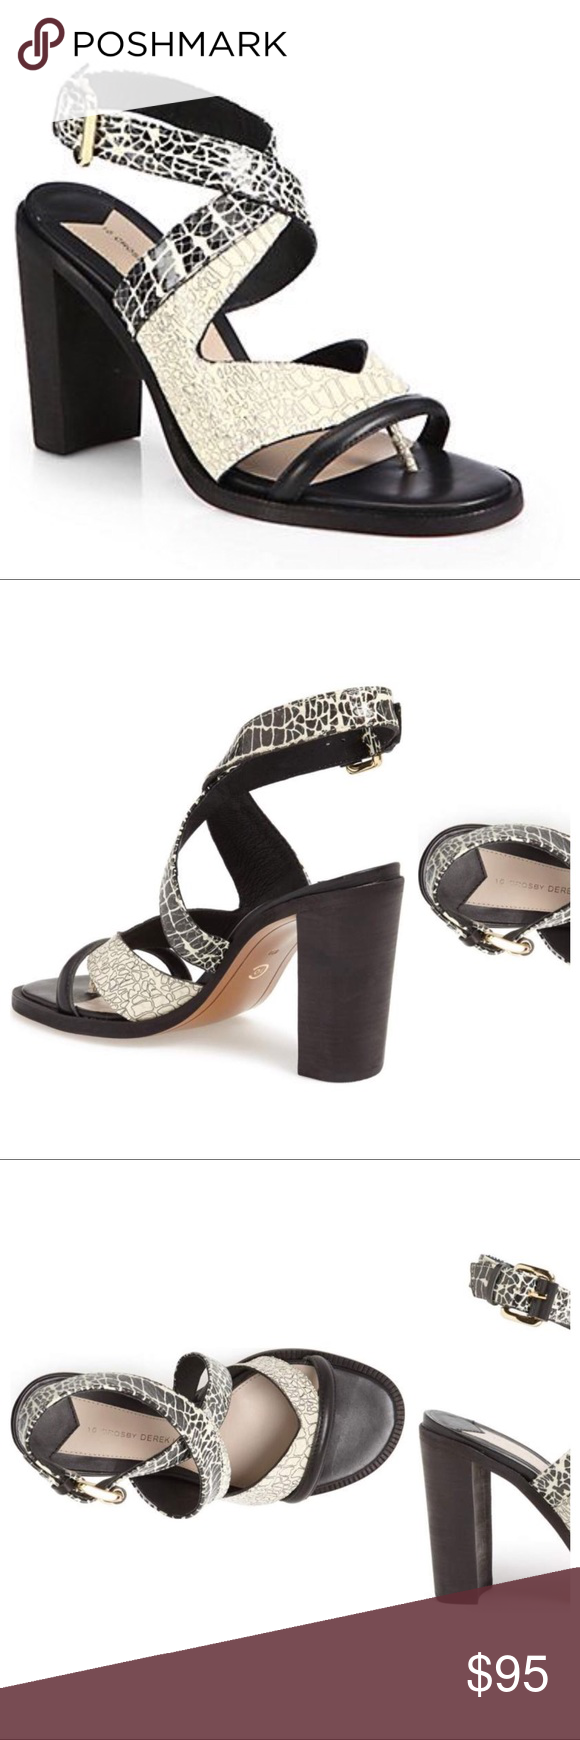 10 Crosby Derek Lam Shirin Sandal Derek Lam Shoes Clothes Design Fashion Tips